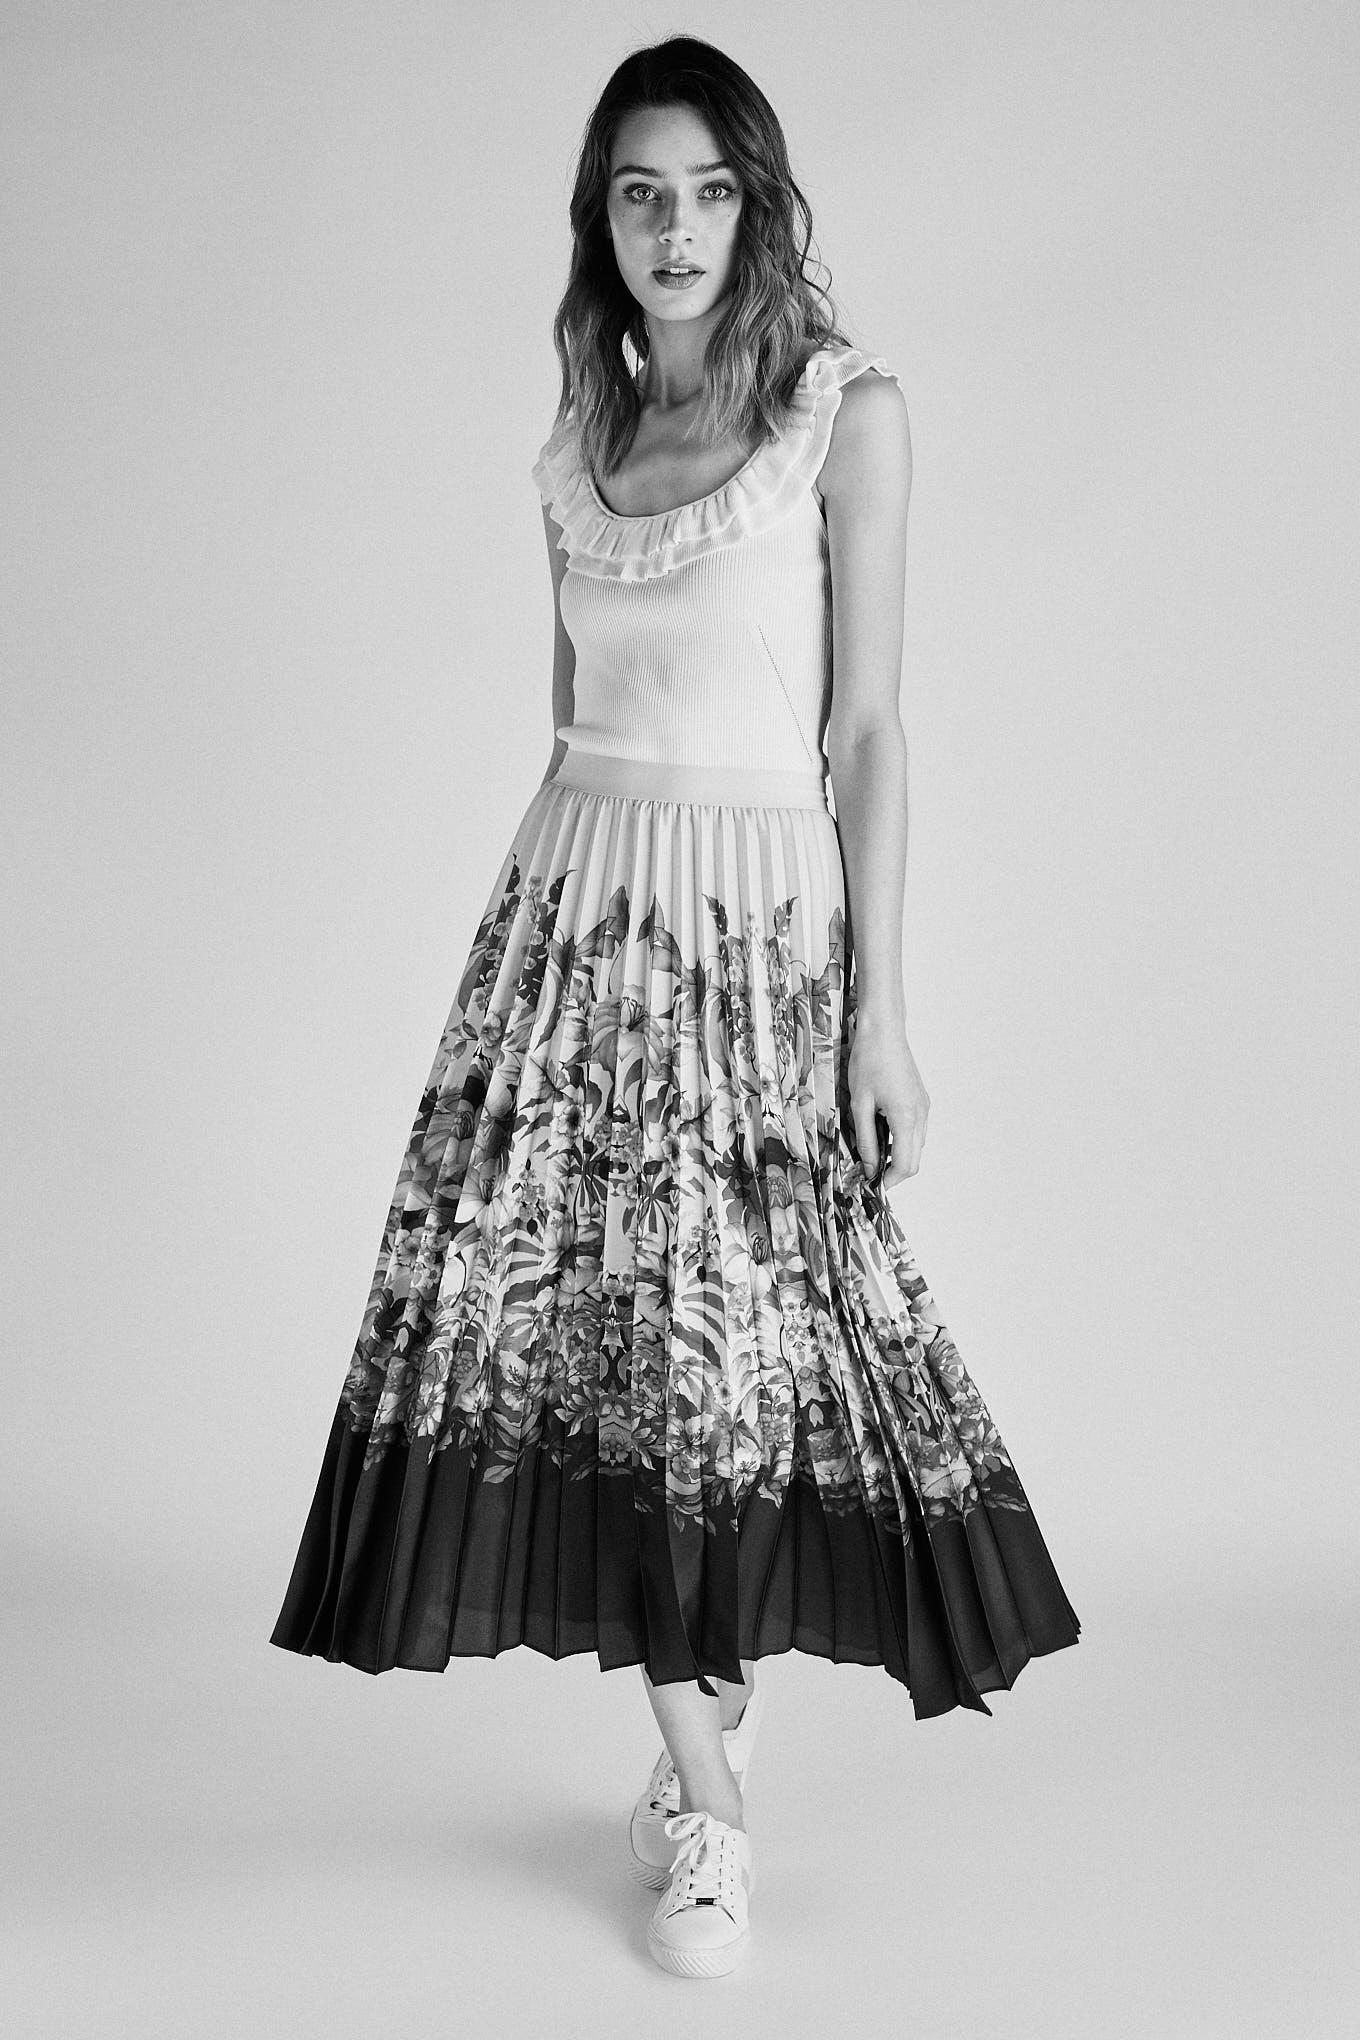 Skirt Print Fantasy Woman